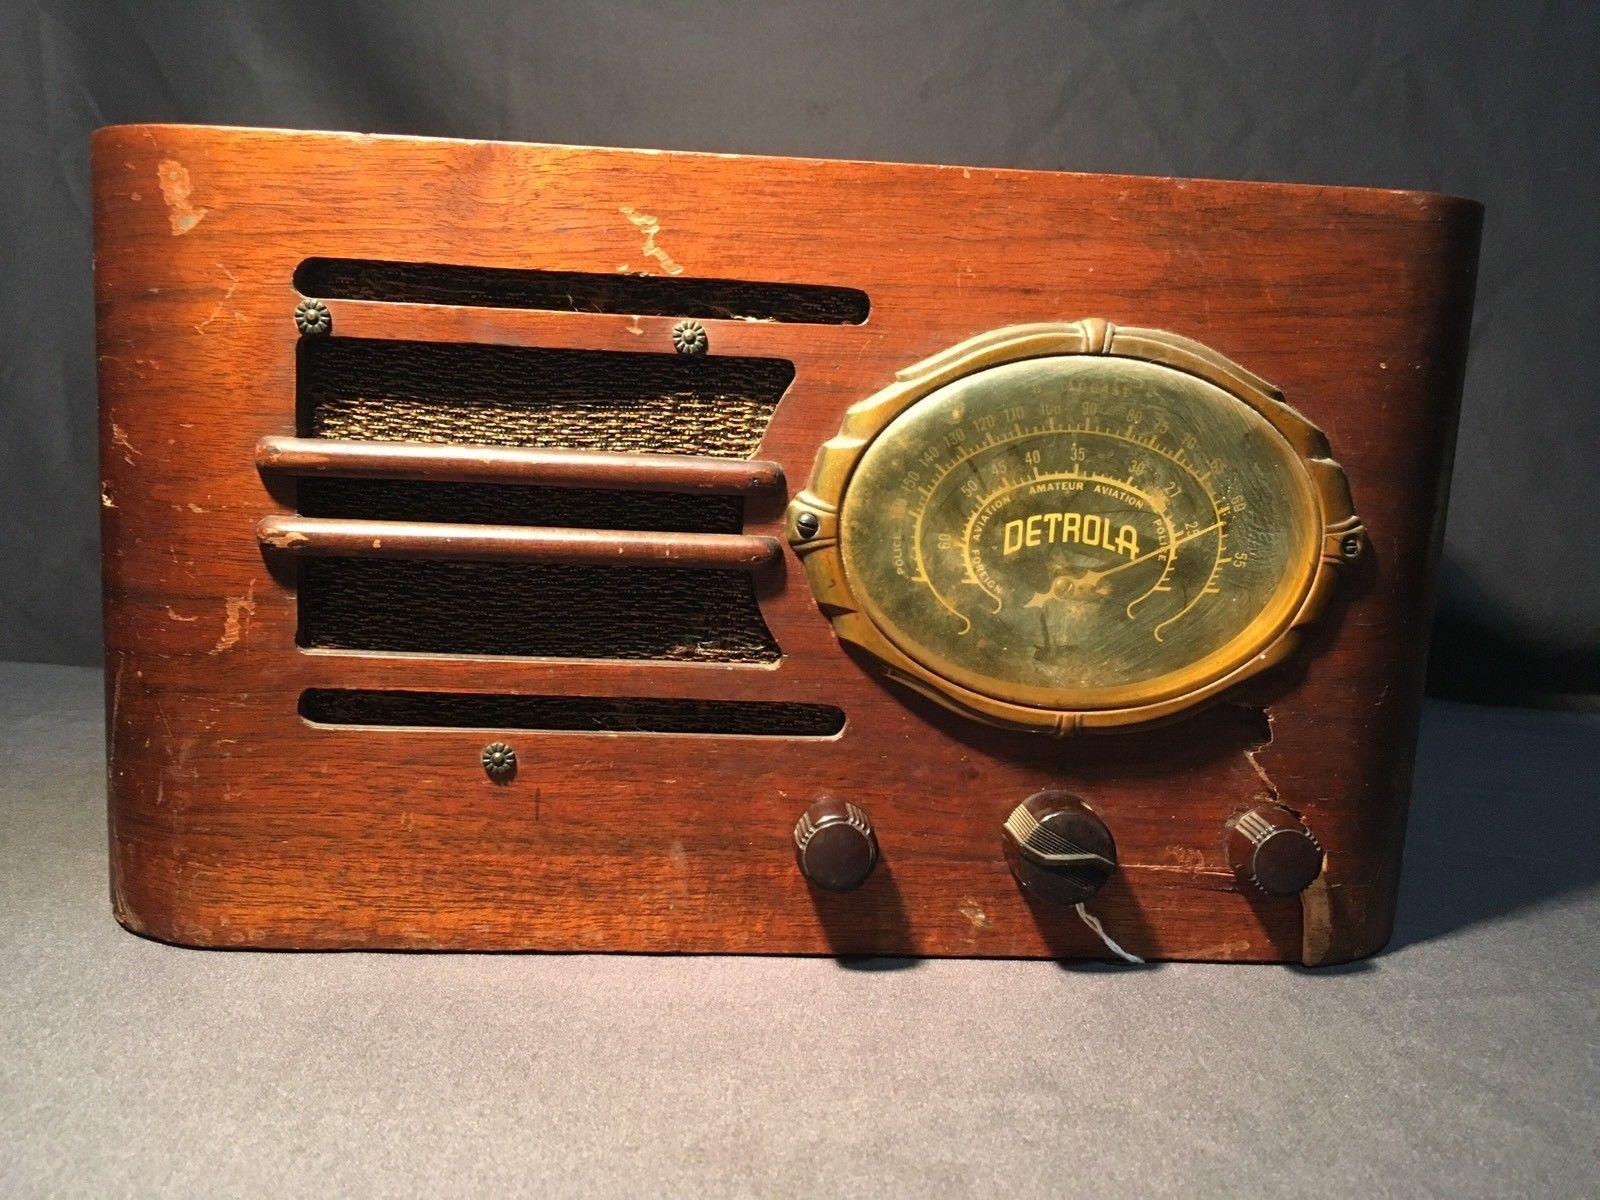 Detrola Tube Radio Model 475702 Ham Radio Parts Or Restore Ebay Vintage Radio Ham Radio Old Radios